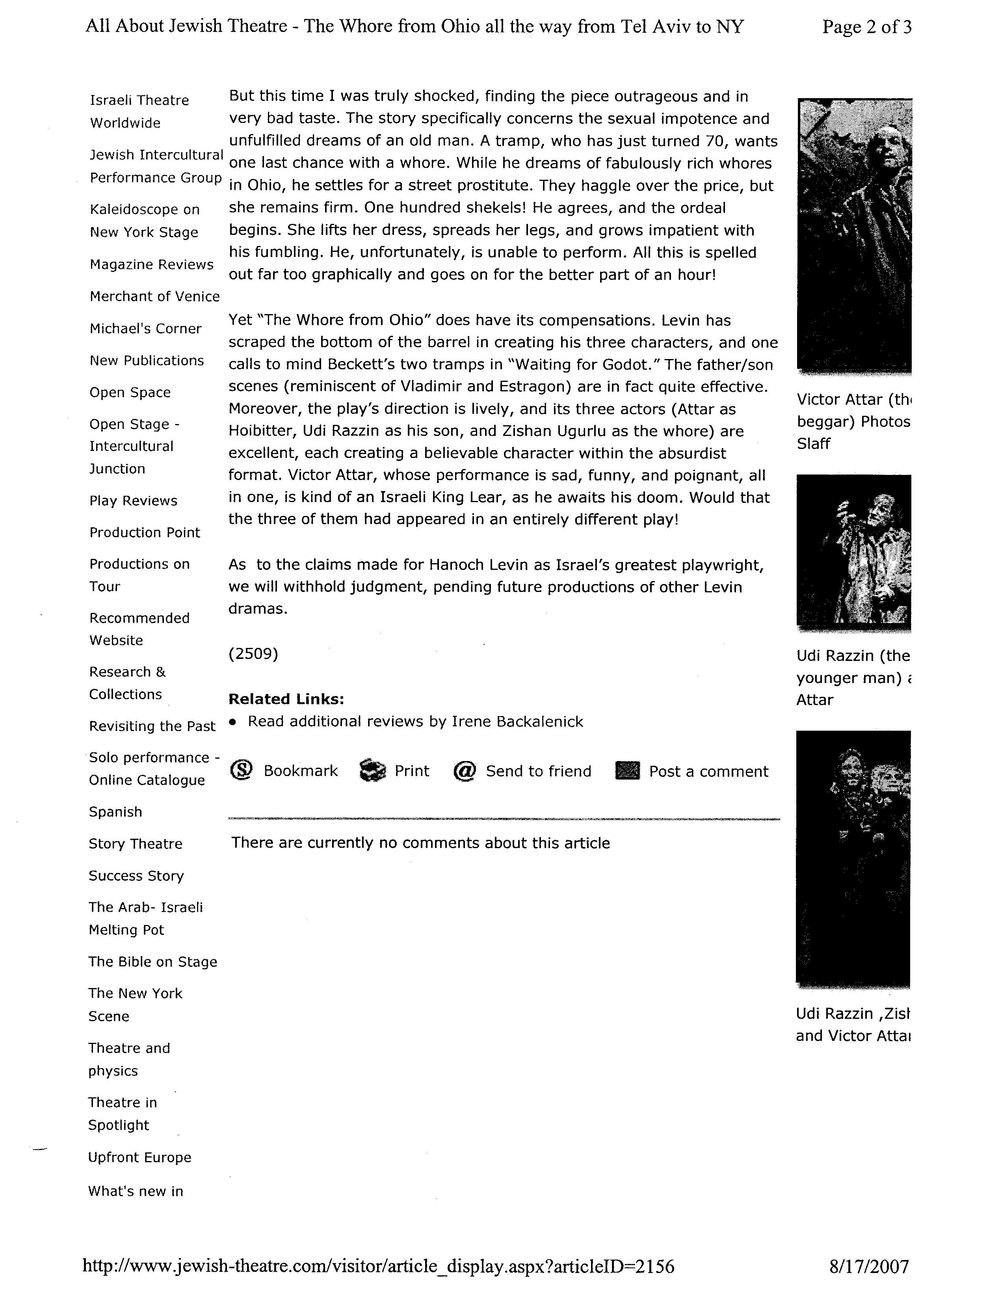 Compilation Dossier 635.jpg